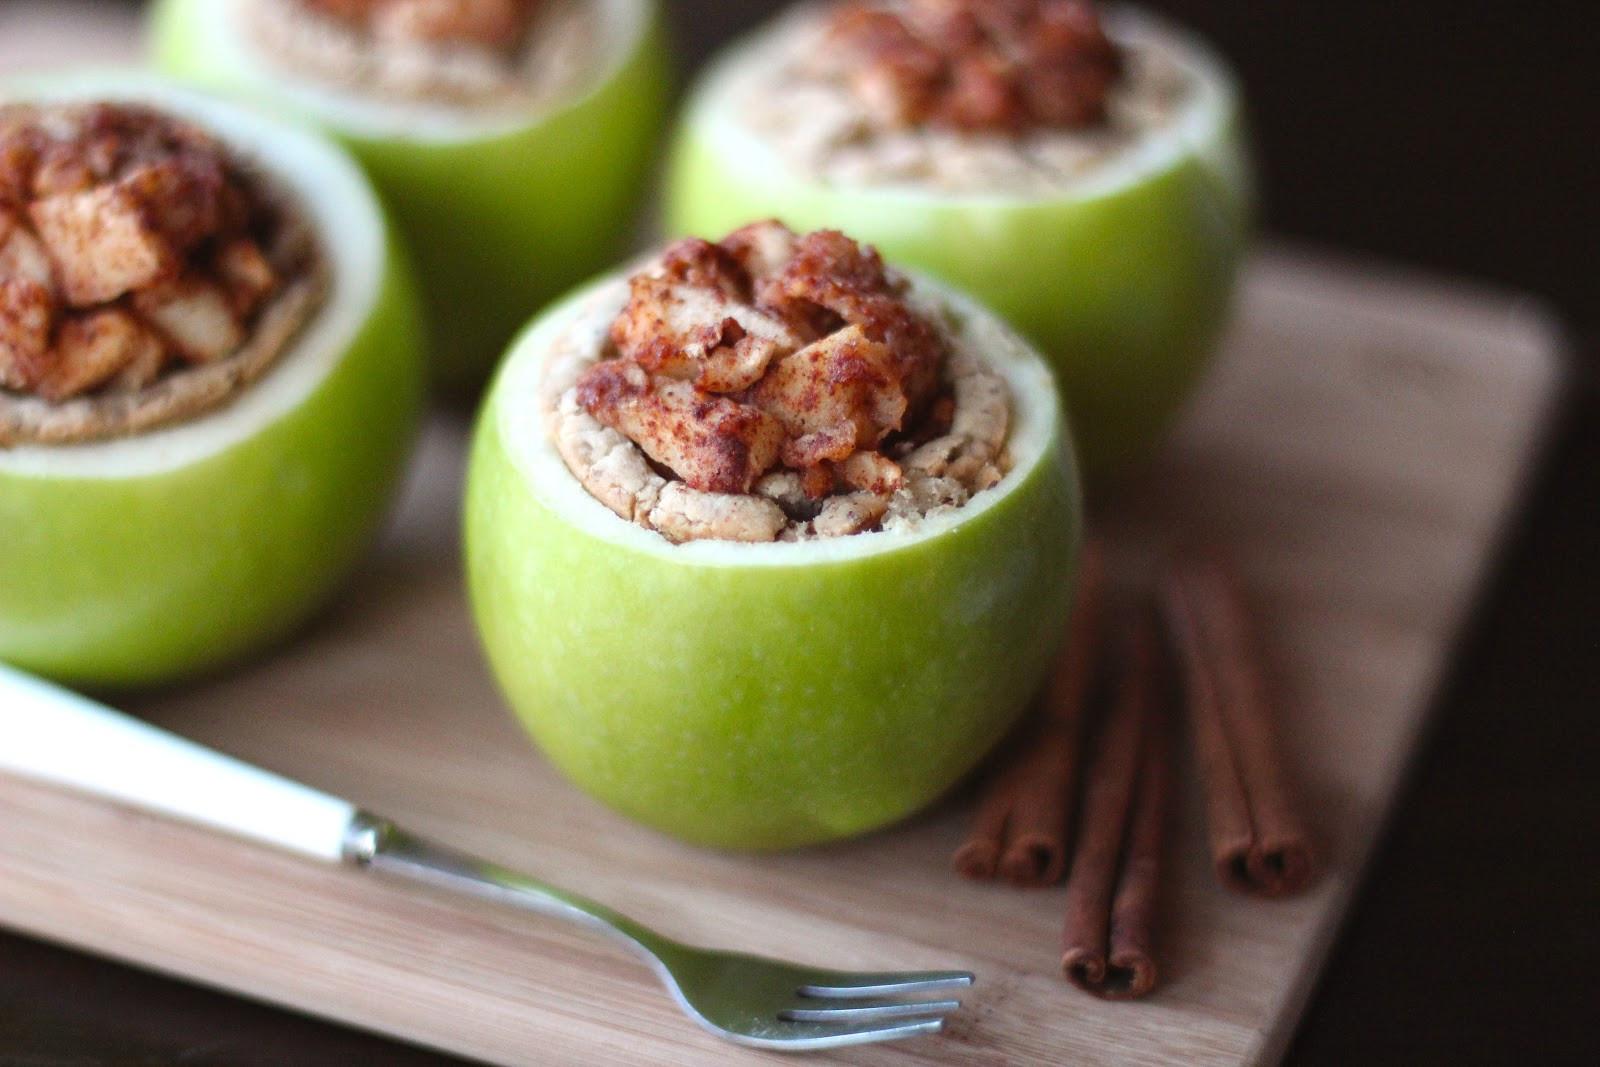 Healthy Apple Pie 20 Best Healthy Apple Pie In An Apple Desserts with Benefits